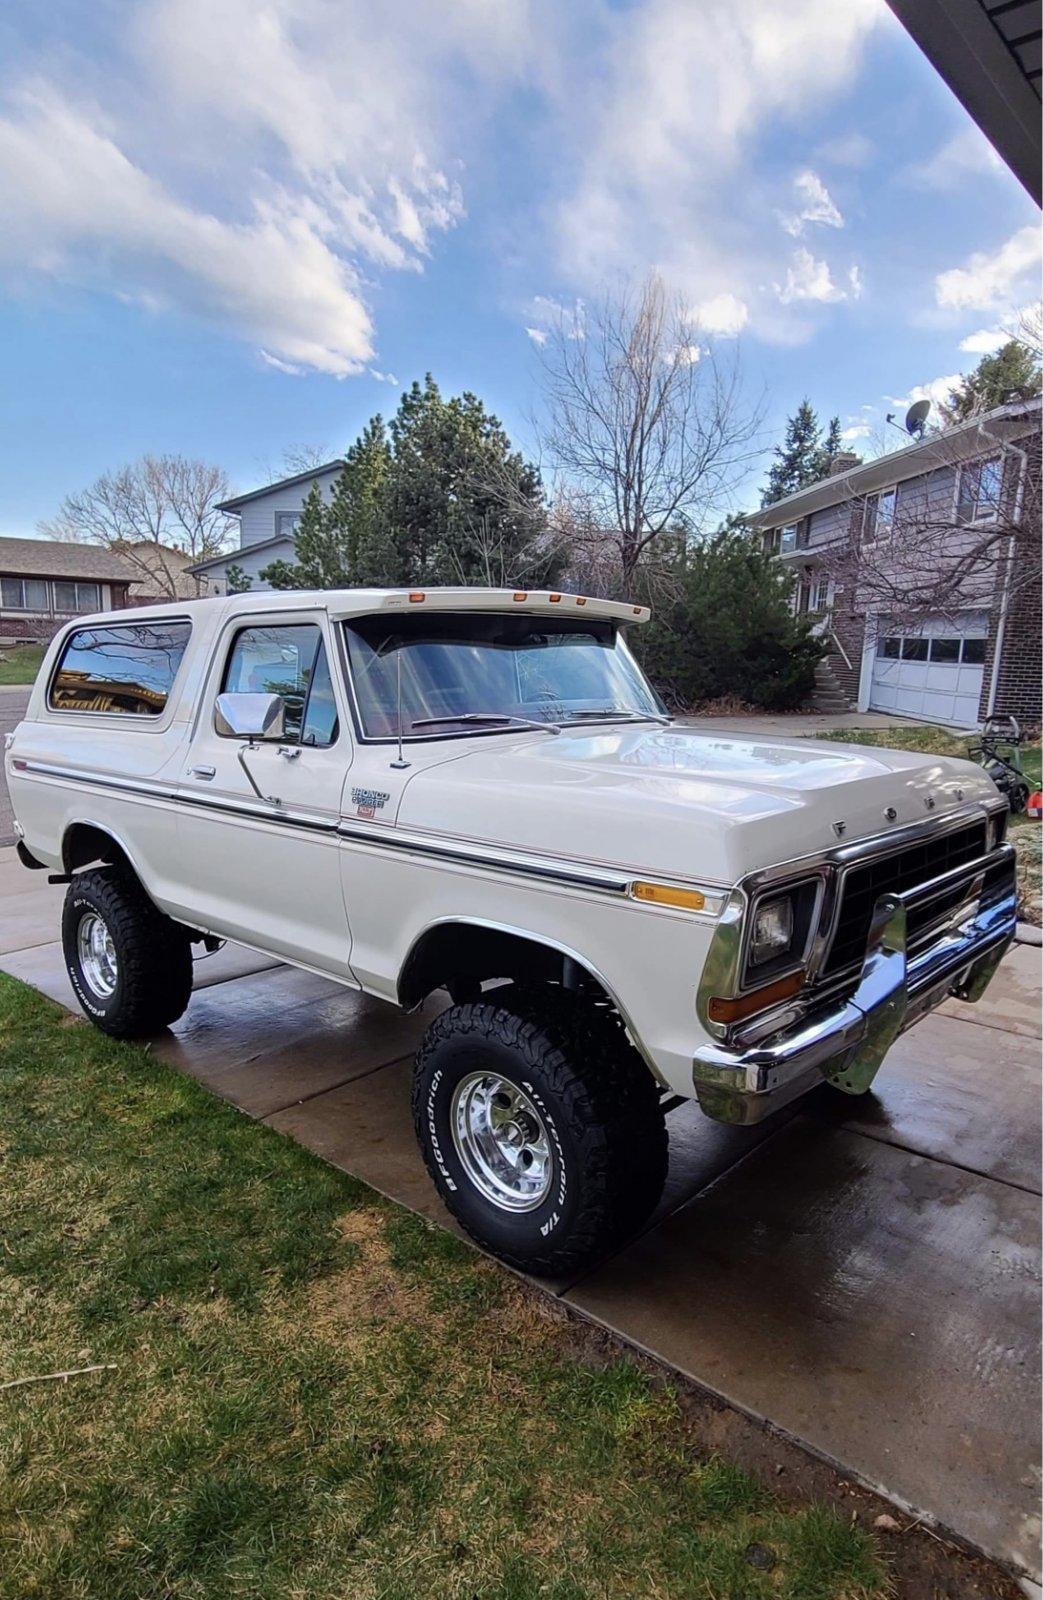 1979 Ford Bronco Ranger XLT Trailer Special - For Sale 2.jpg